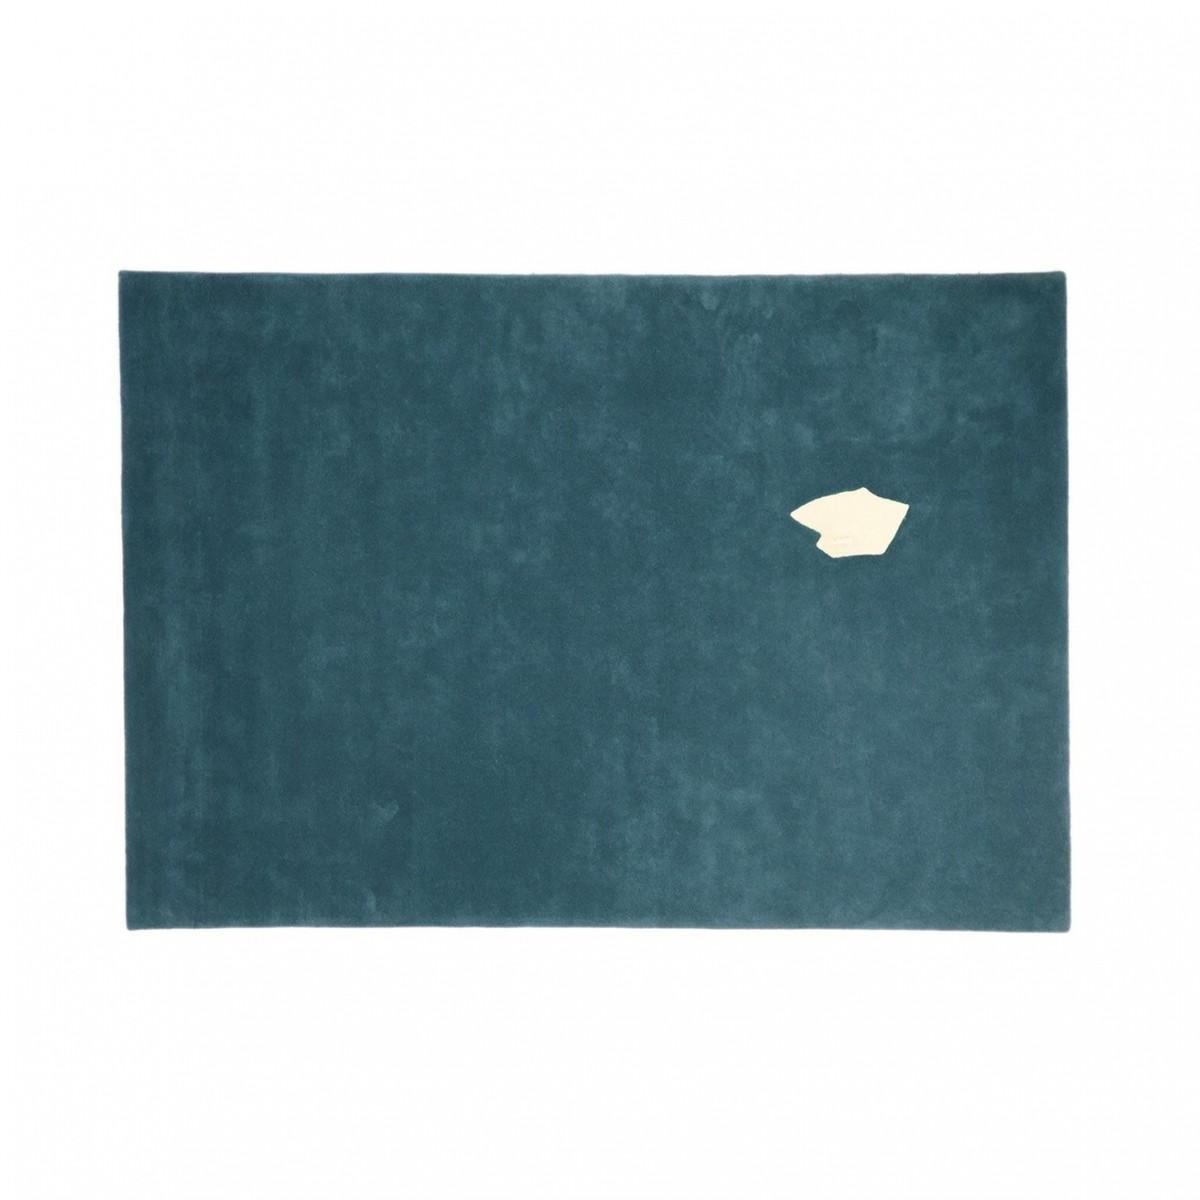 global warming tapijt met ijsbeer nanimarquina. Black Bedroom Furniture Sets. Home Design Ideas